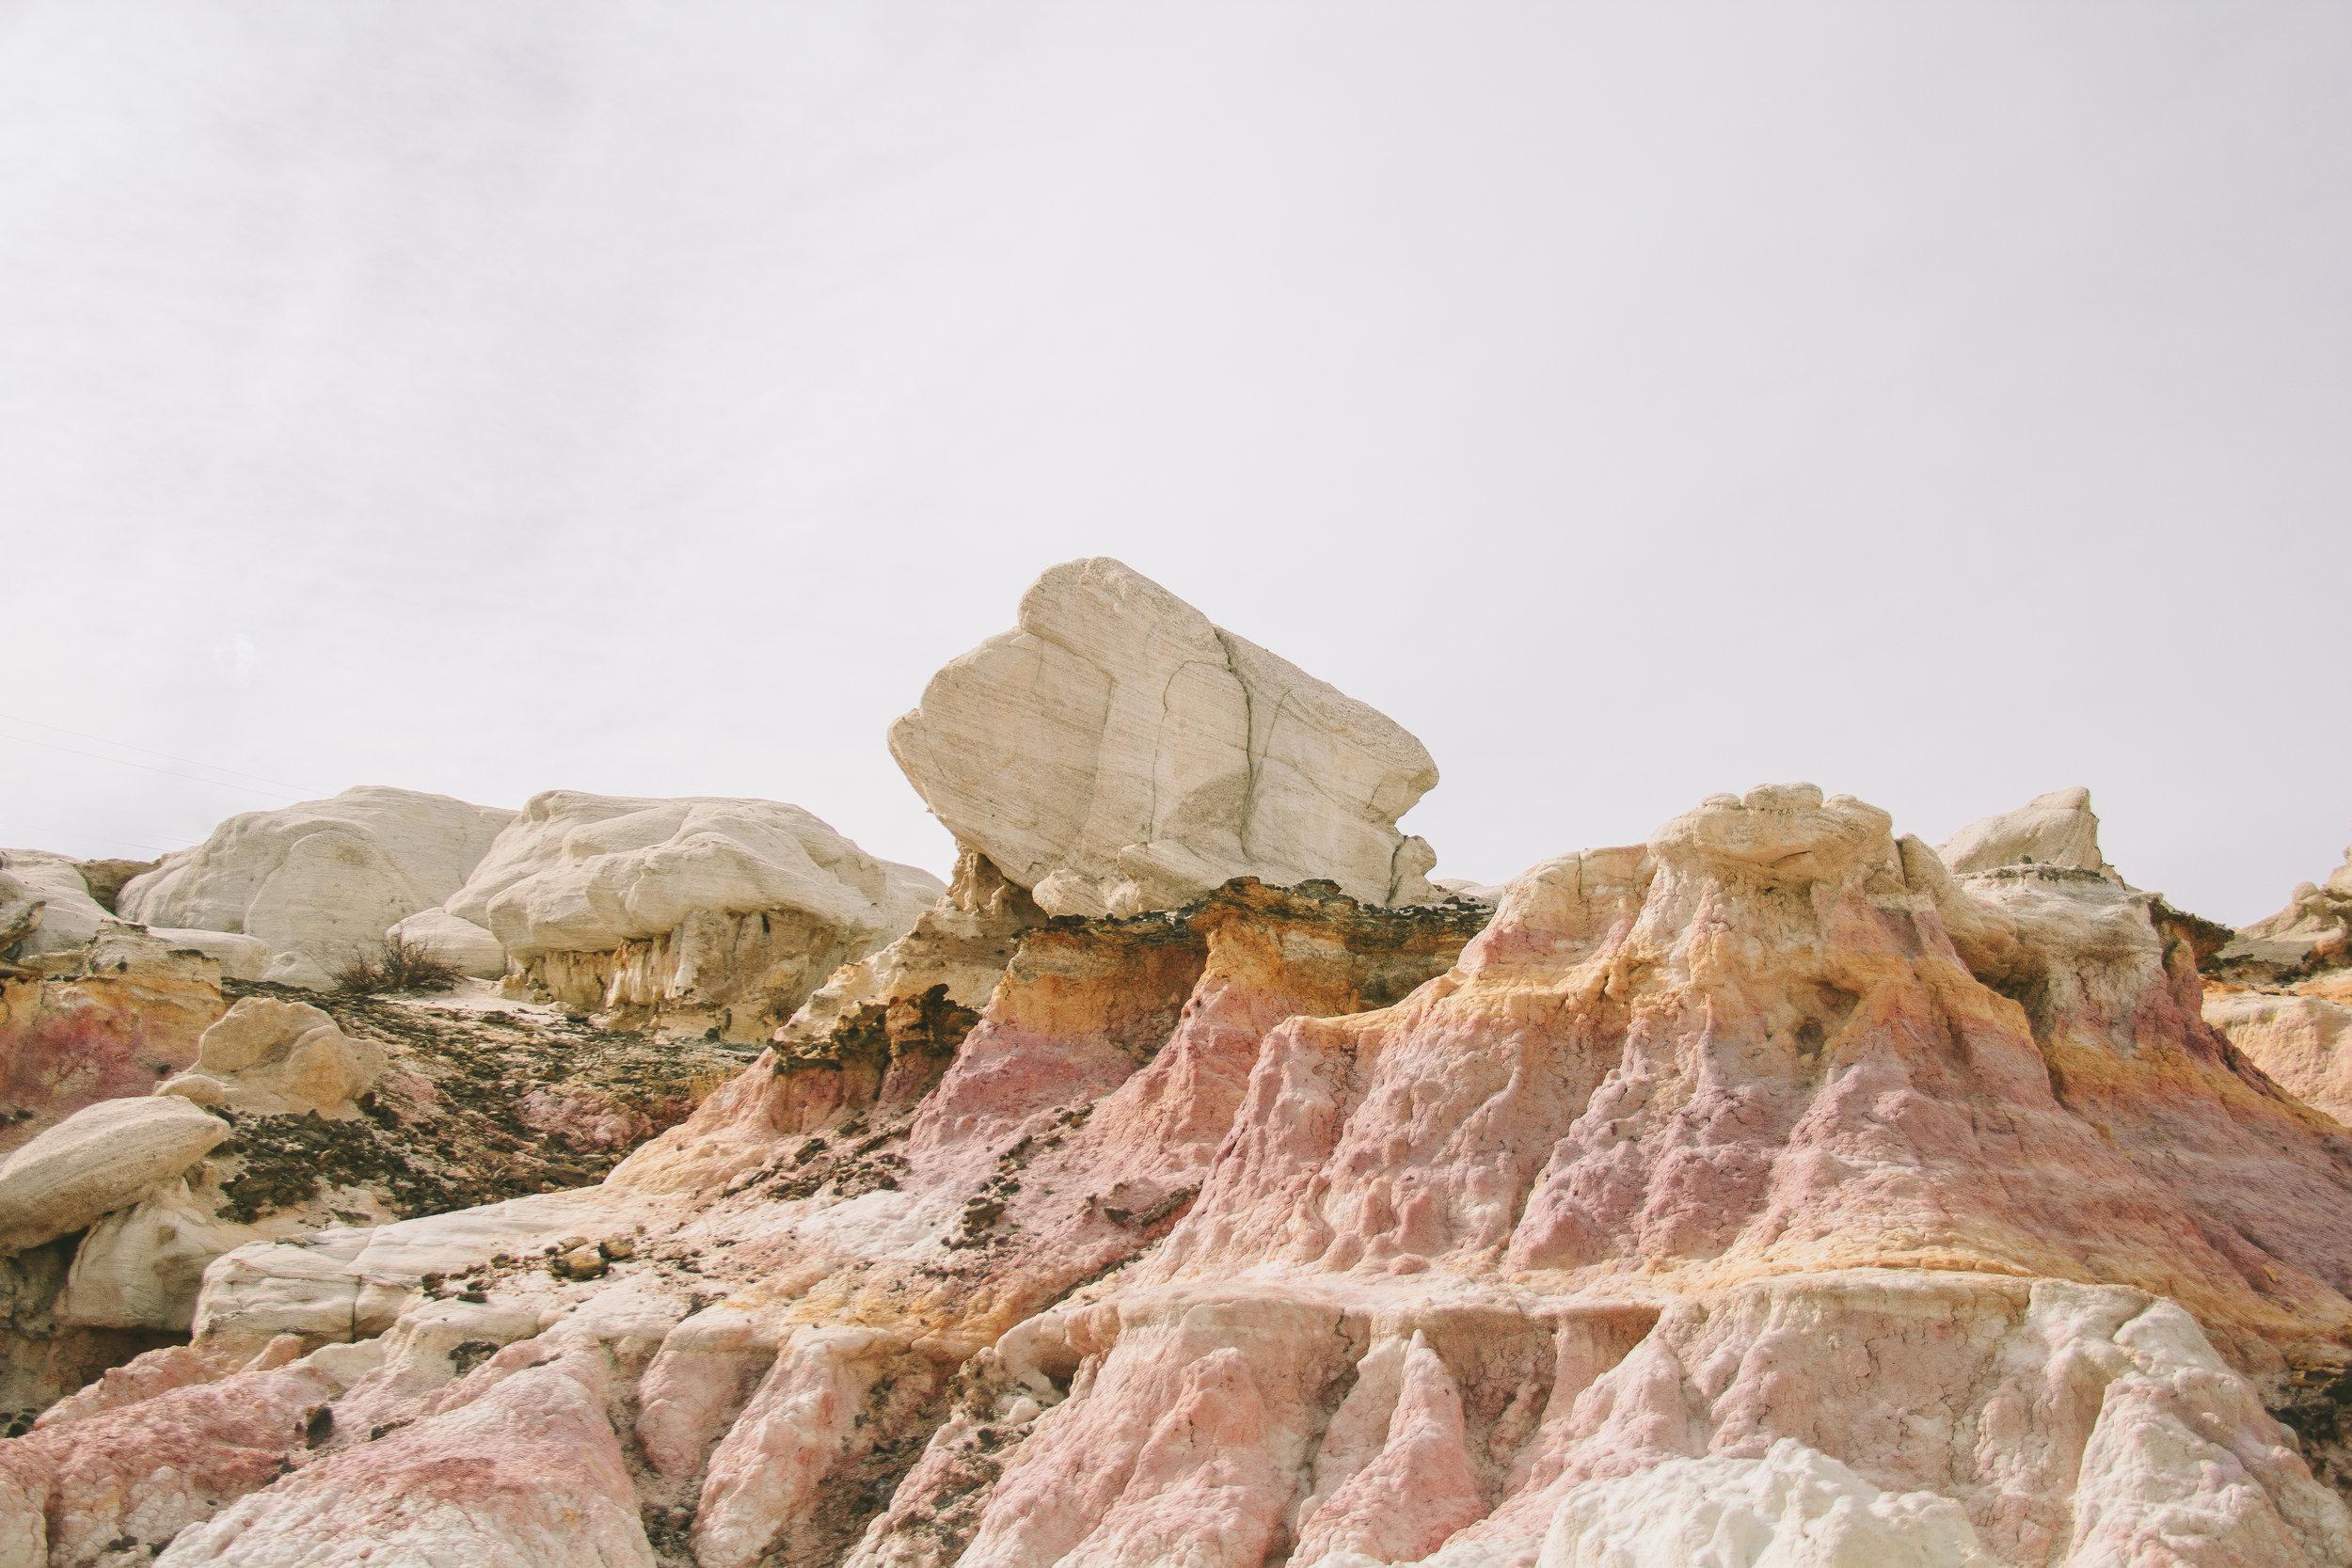 MP_17.02.11_Paint Mines-Colorado Springs-3110-web.jpg